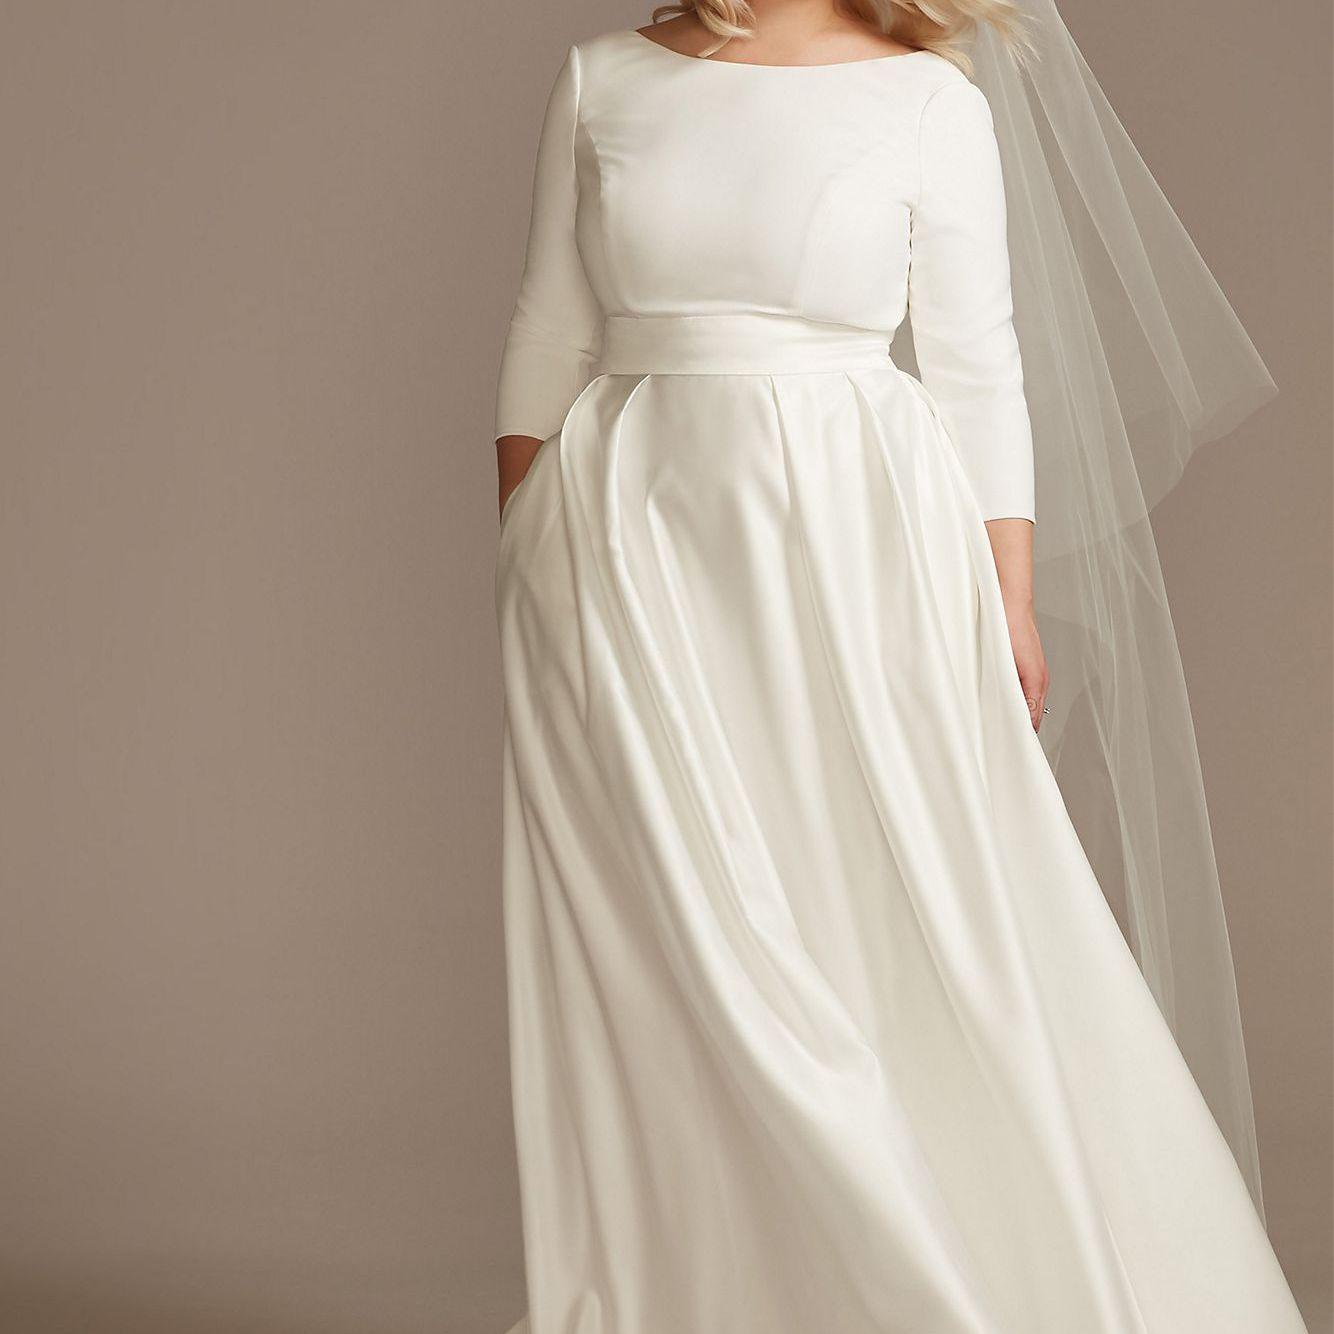 Mid-Sleeve Satin Plus Size Wedding Dress